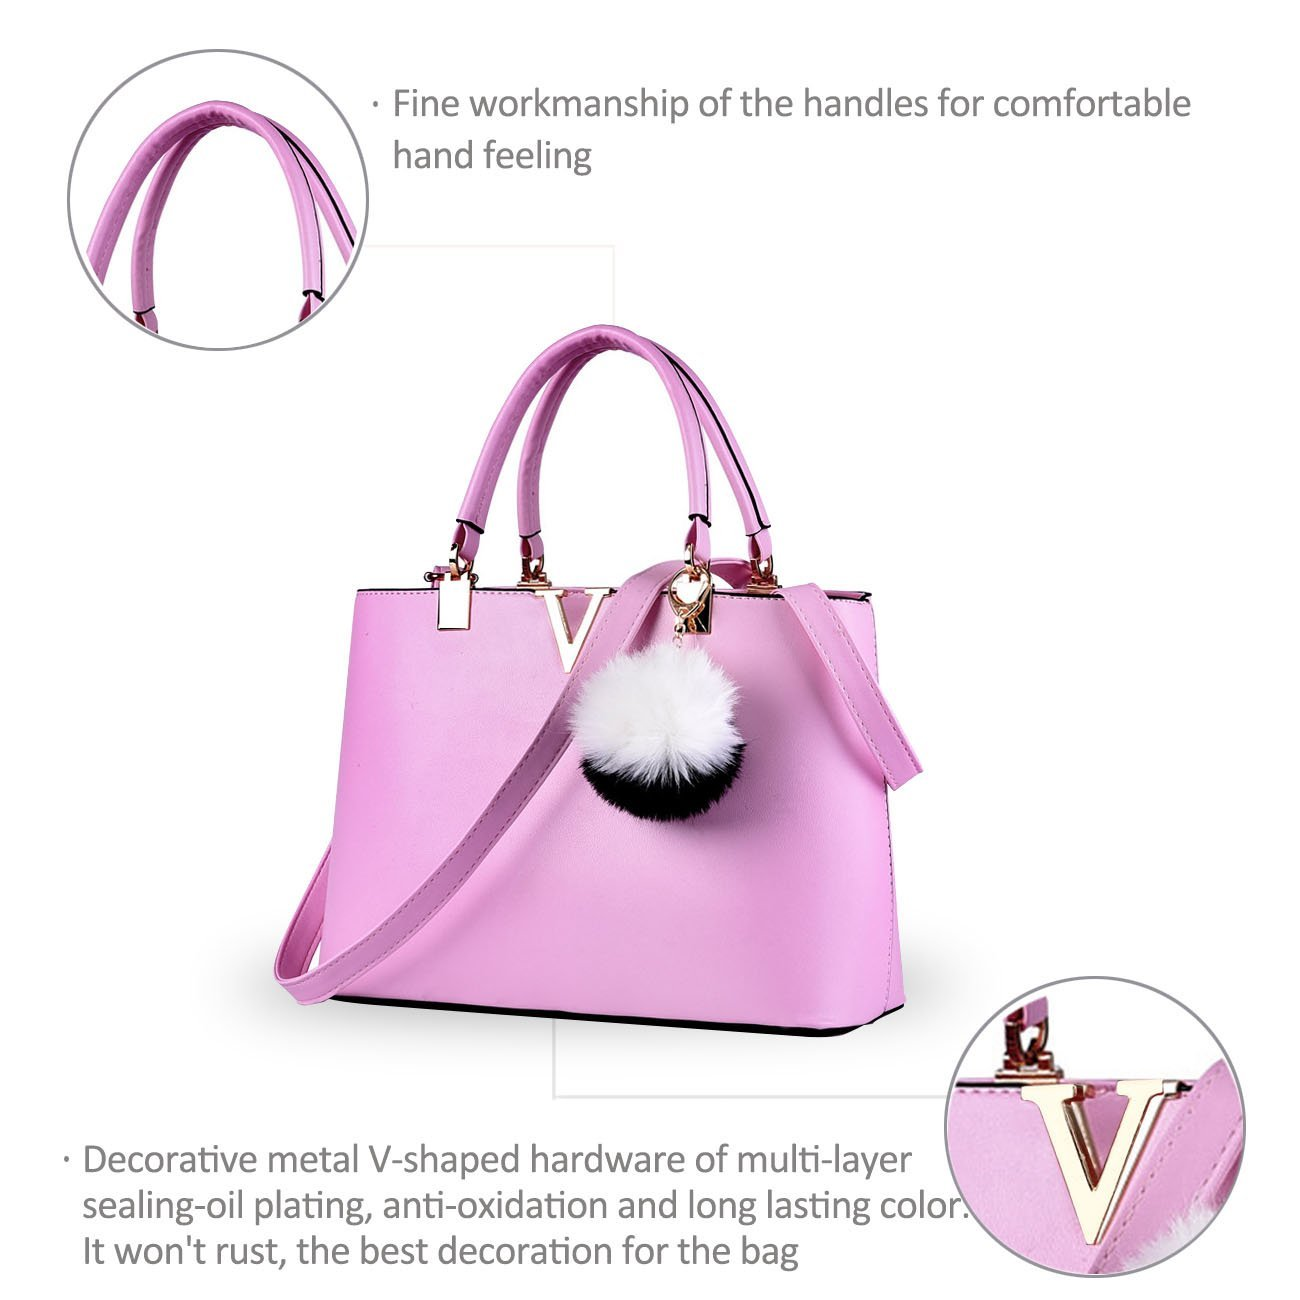 NICOLE & DORIS For Women's Casual Shoulder Cross Body Bags Spring 2017 Spring New Trends Minimal Fashion Handbags (Purple) by NICOLE & DORIS (Image #7)